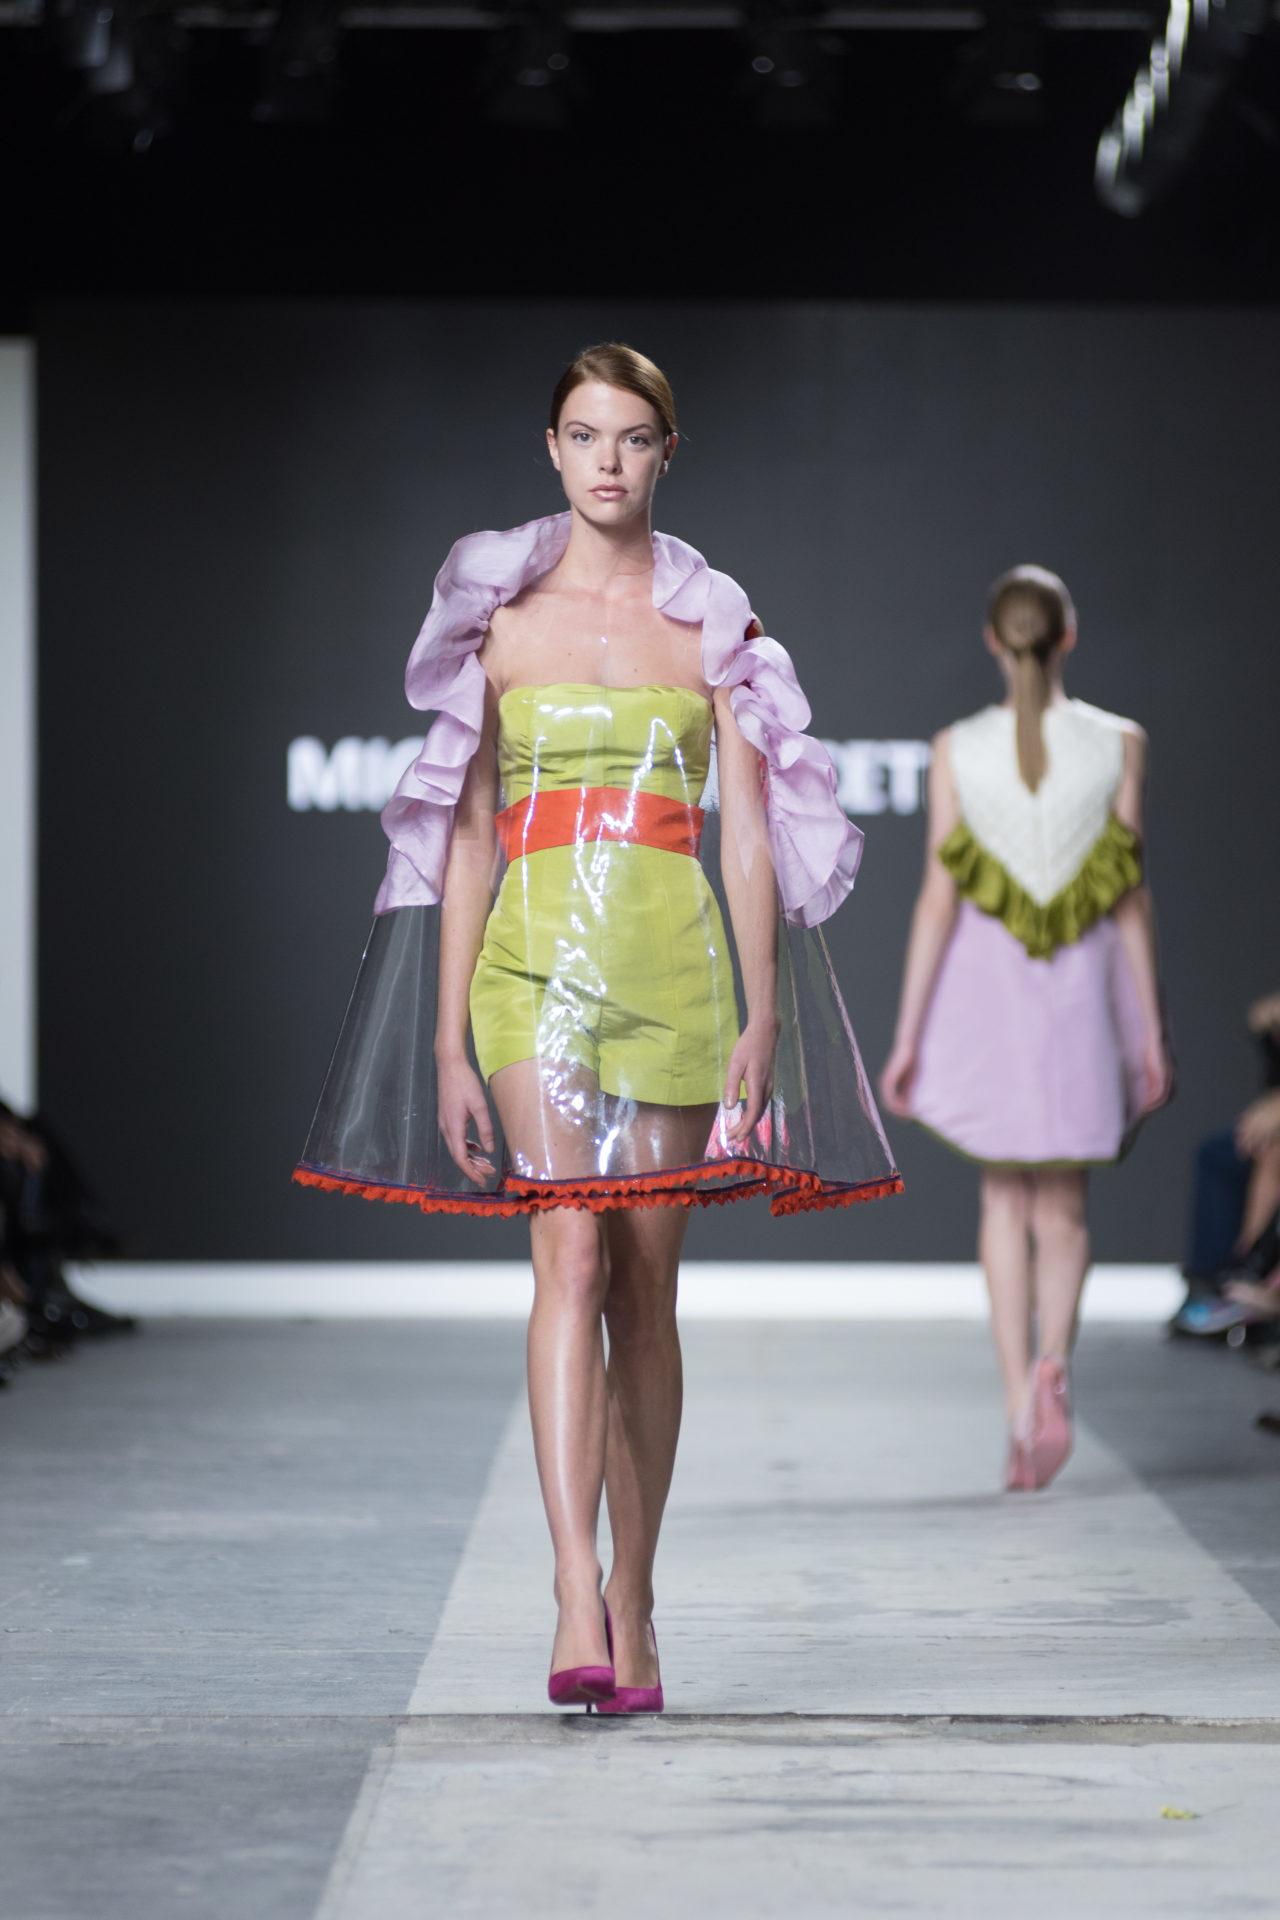 Accademia costume moda fashion show fashion graduate for Accademia fashion design milano